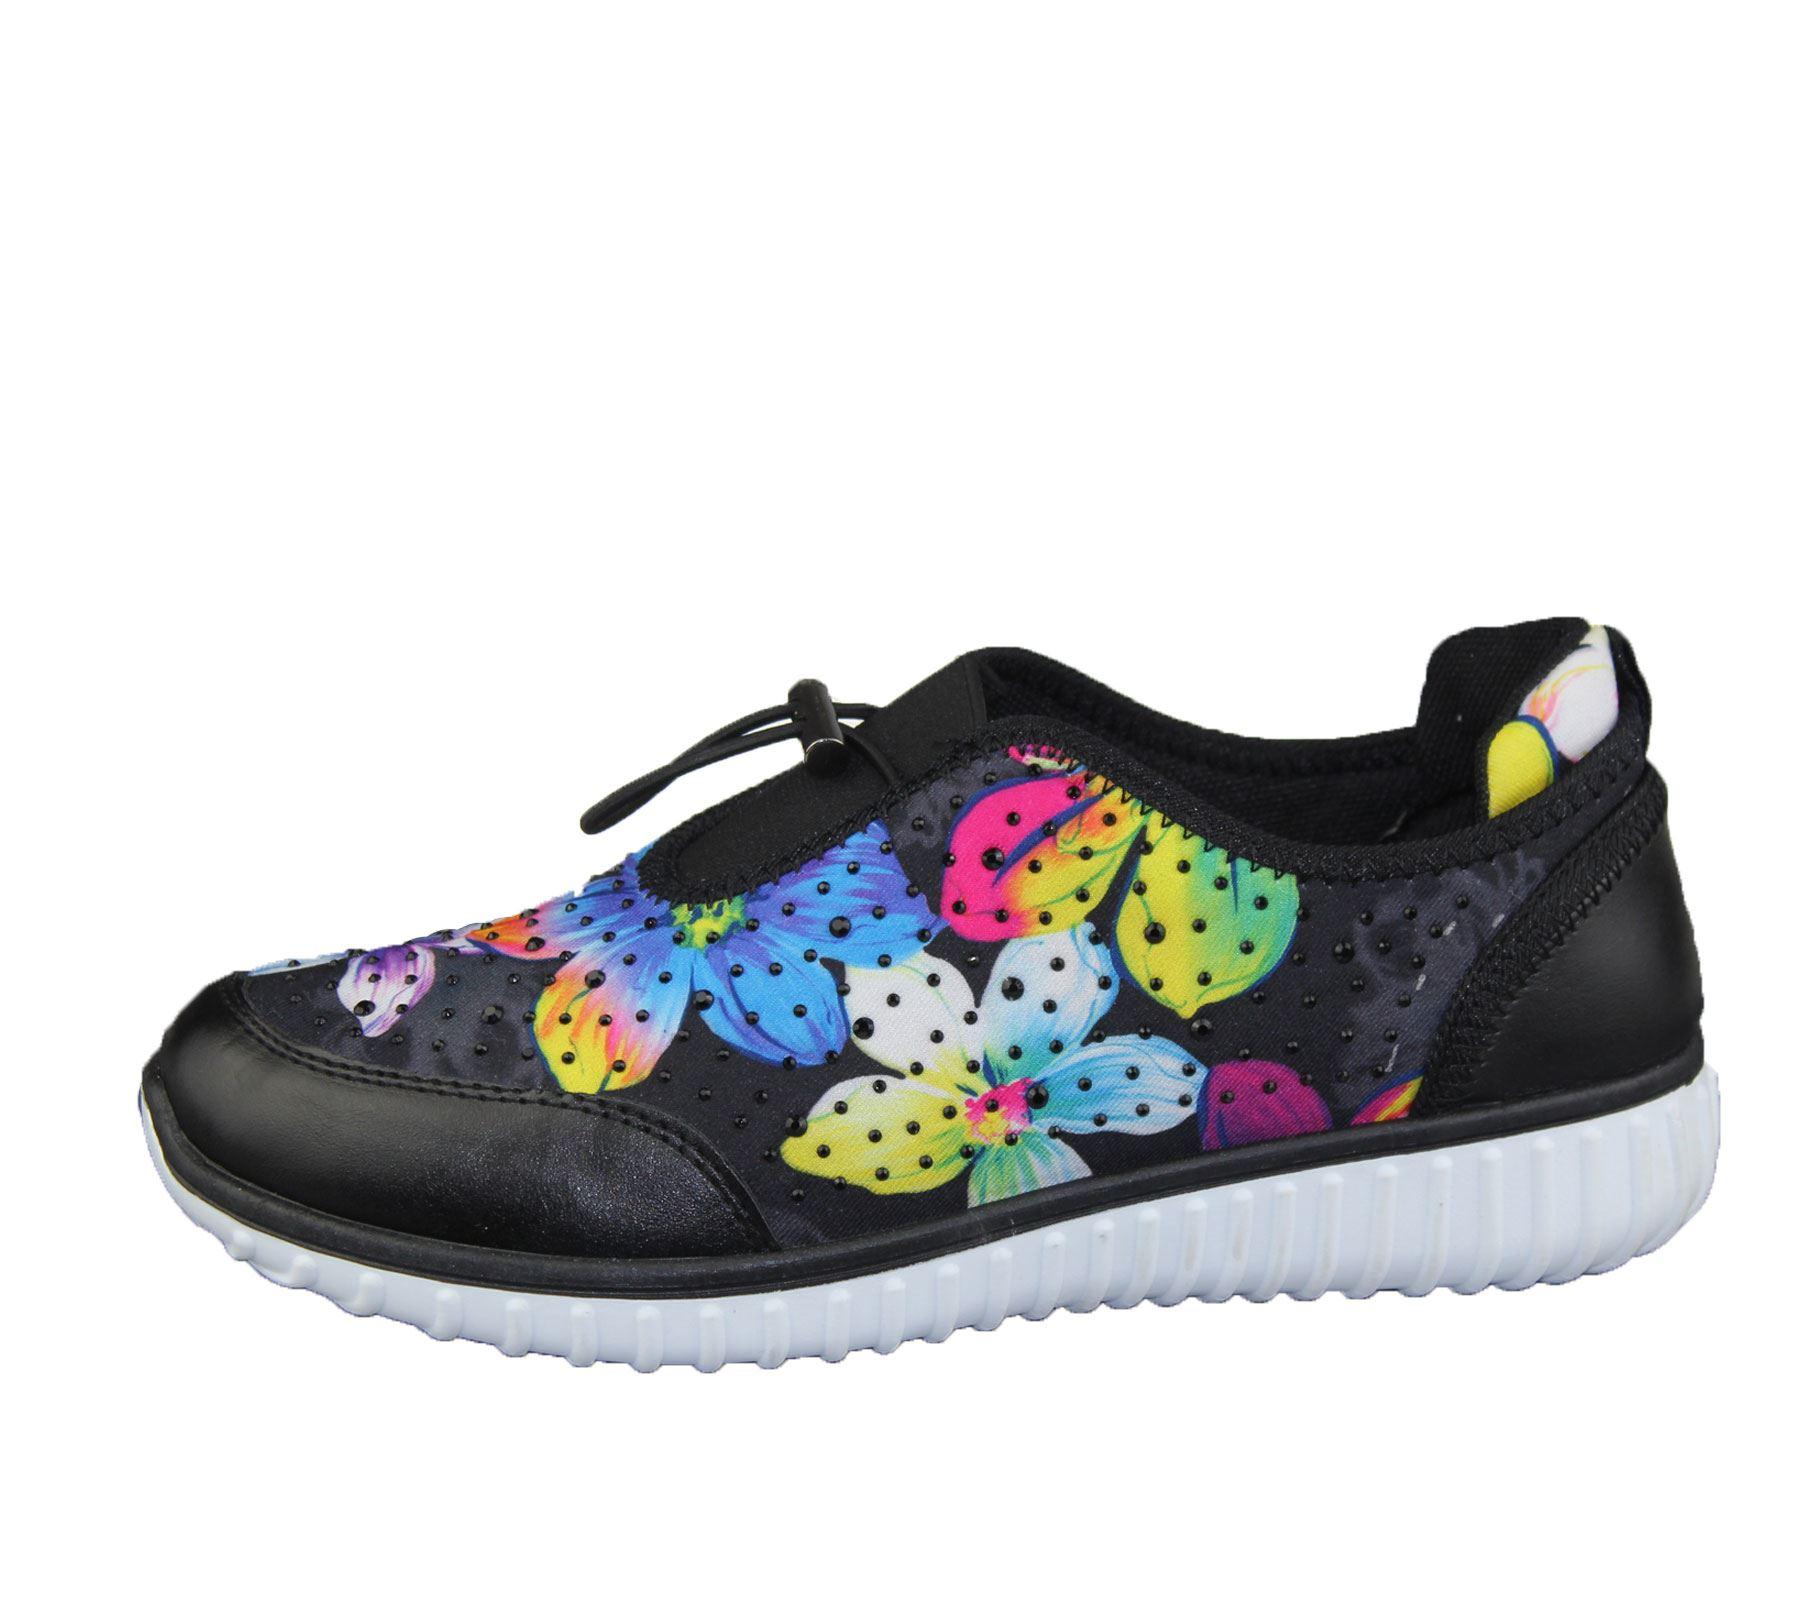 Womens-Trainer-Ladies-Comfort-Walking-Fashion-Summer-Gym-Sport-Flat-Shoes-Size thumbnail 3